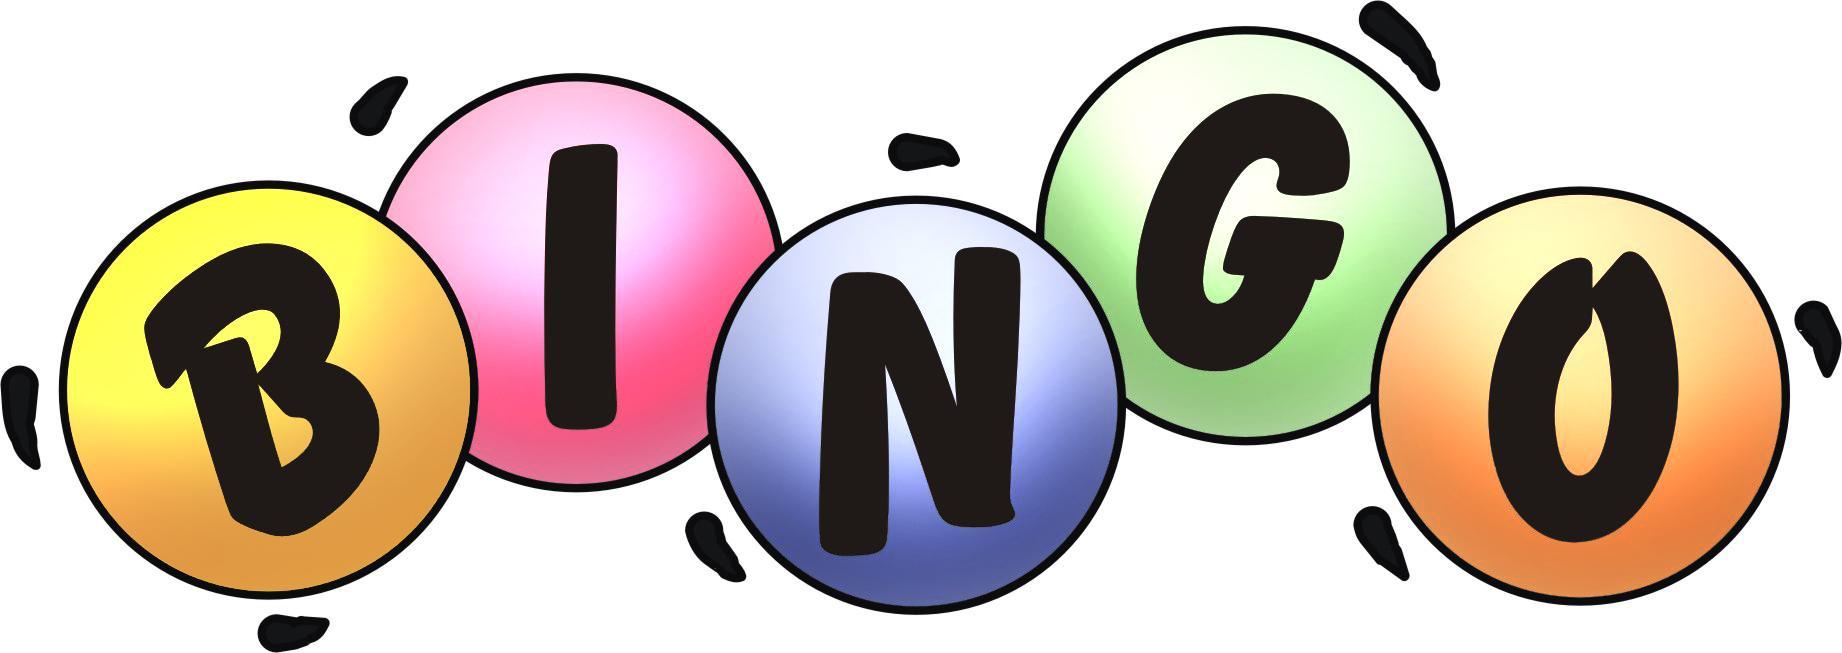 . hdclipartall.com Bingo Clip - Bingo Clipart